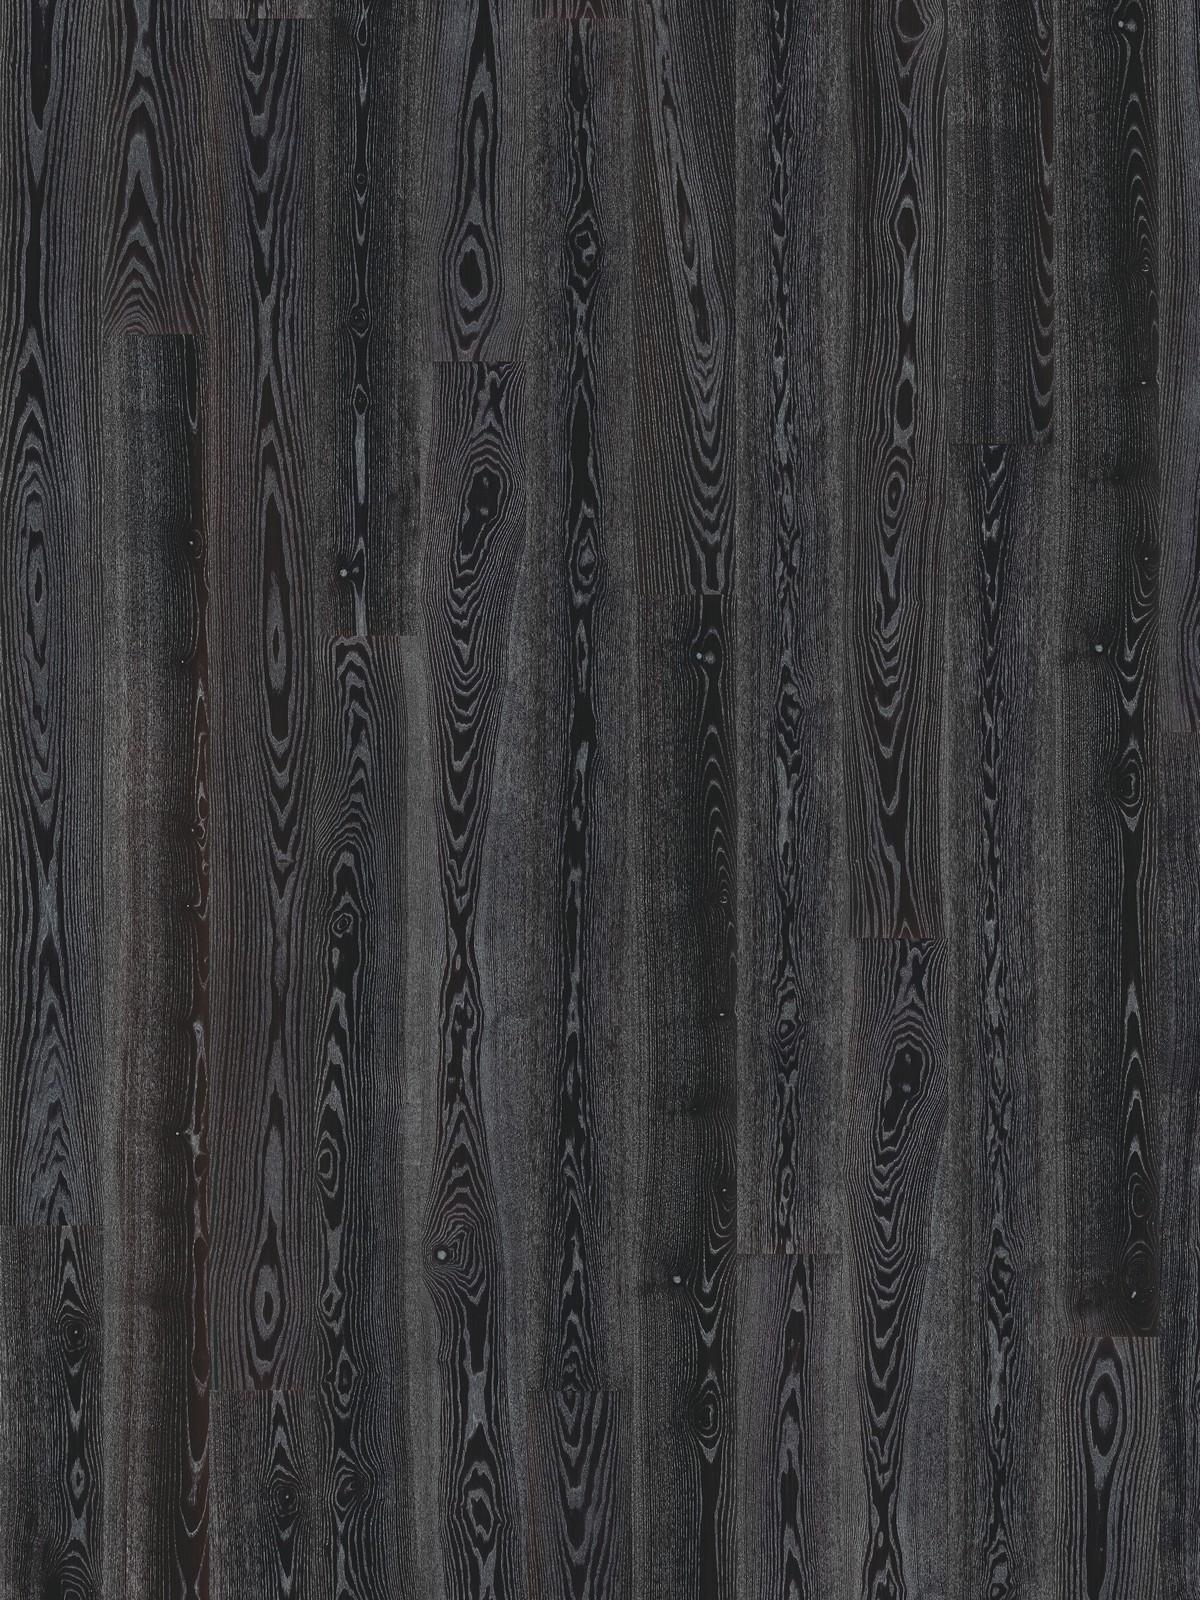 Parchet triplustratificat Frasin Black Silver